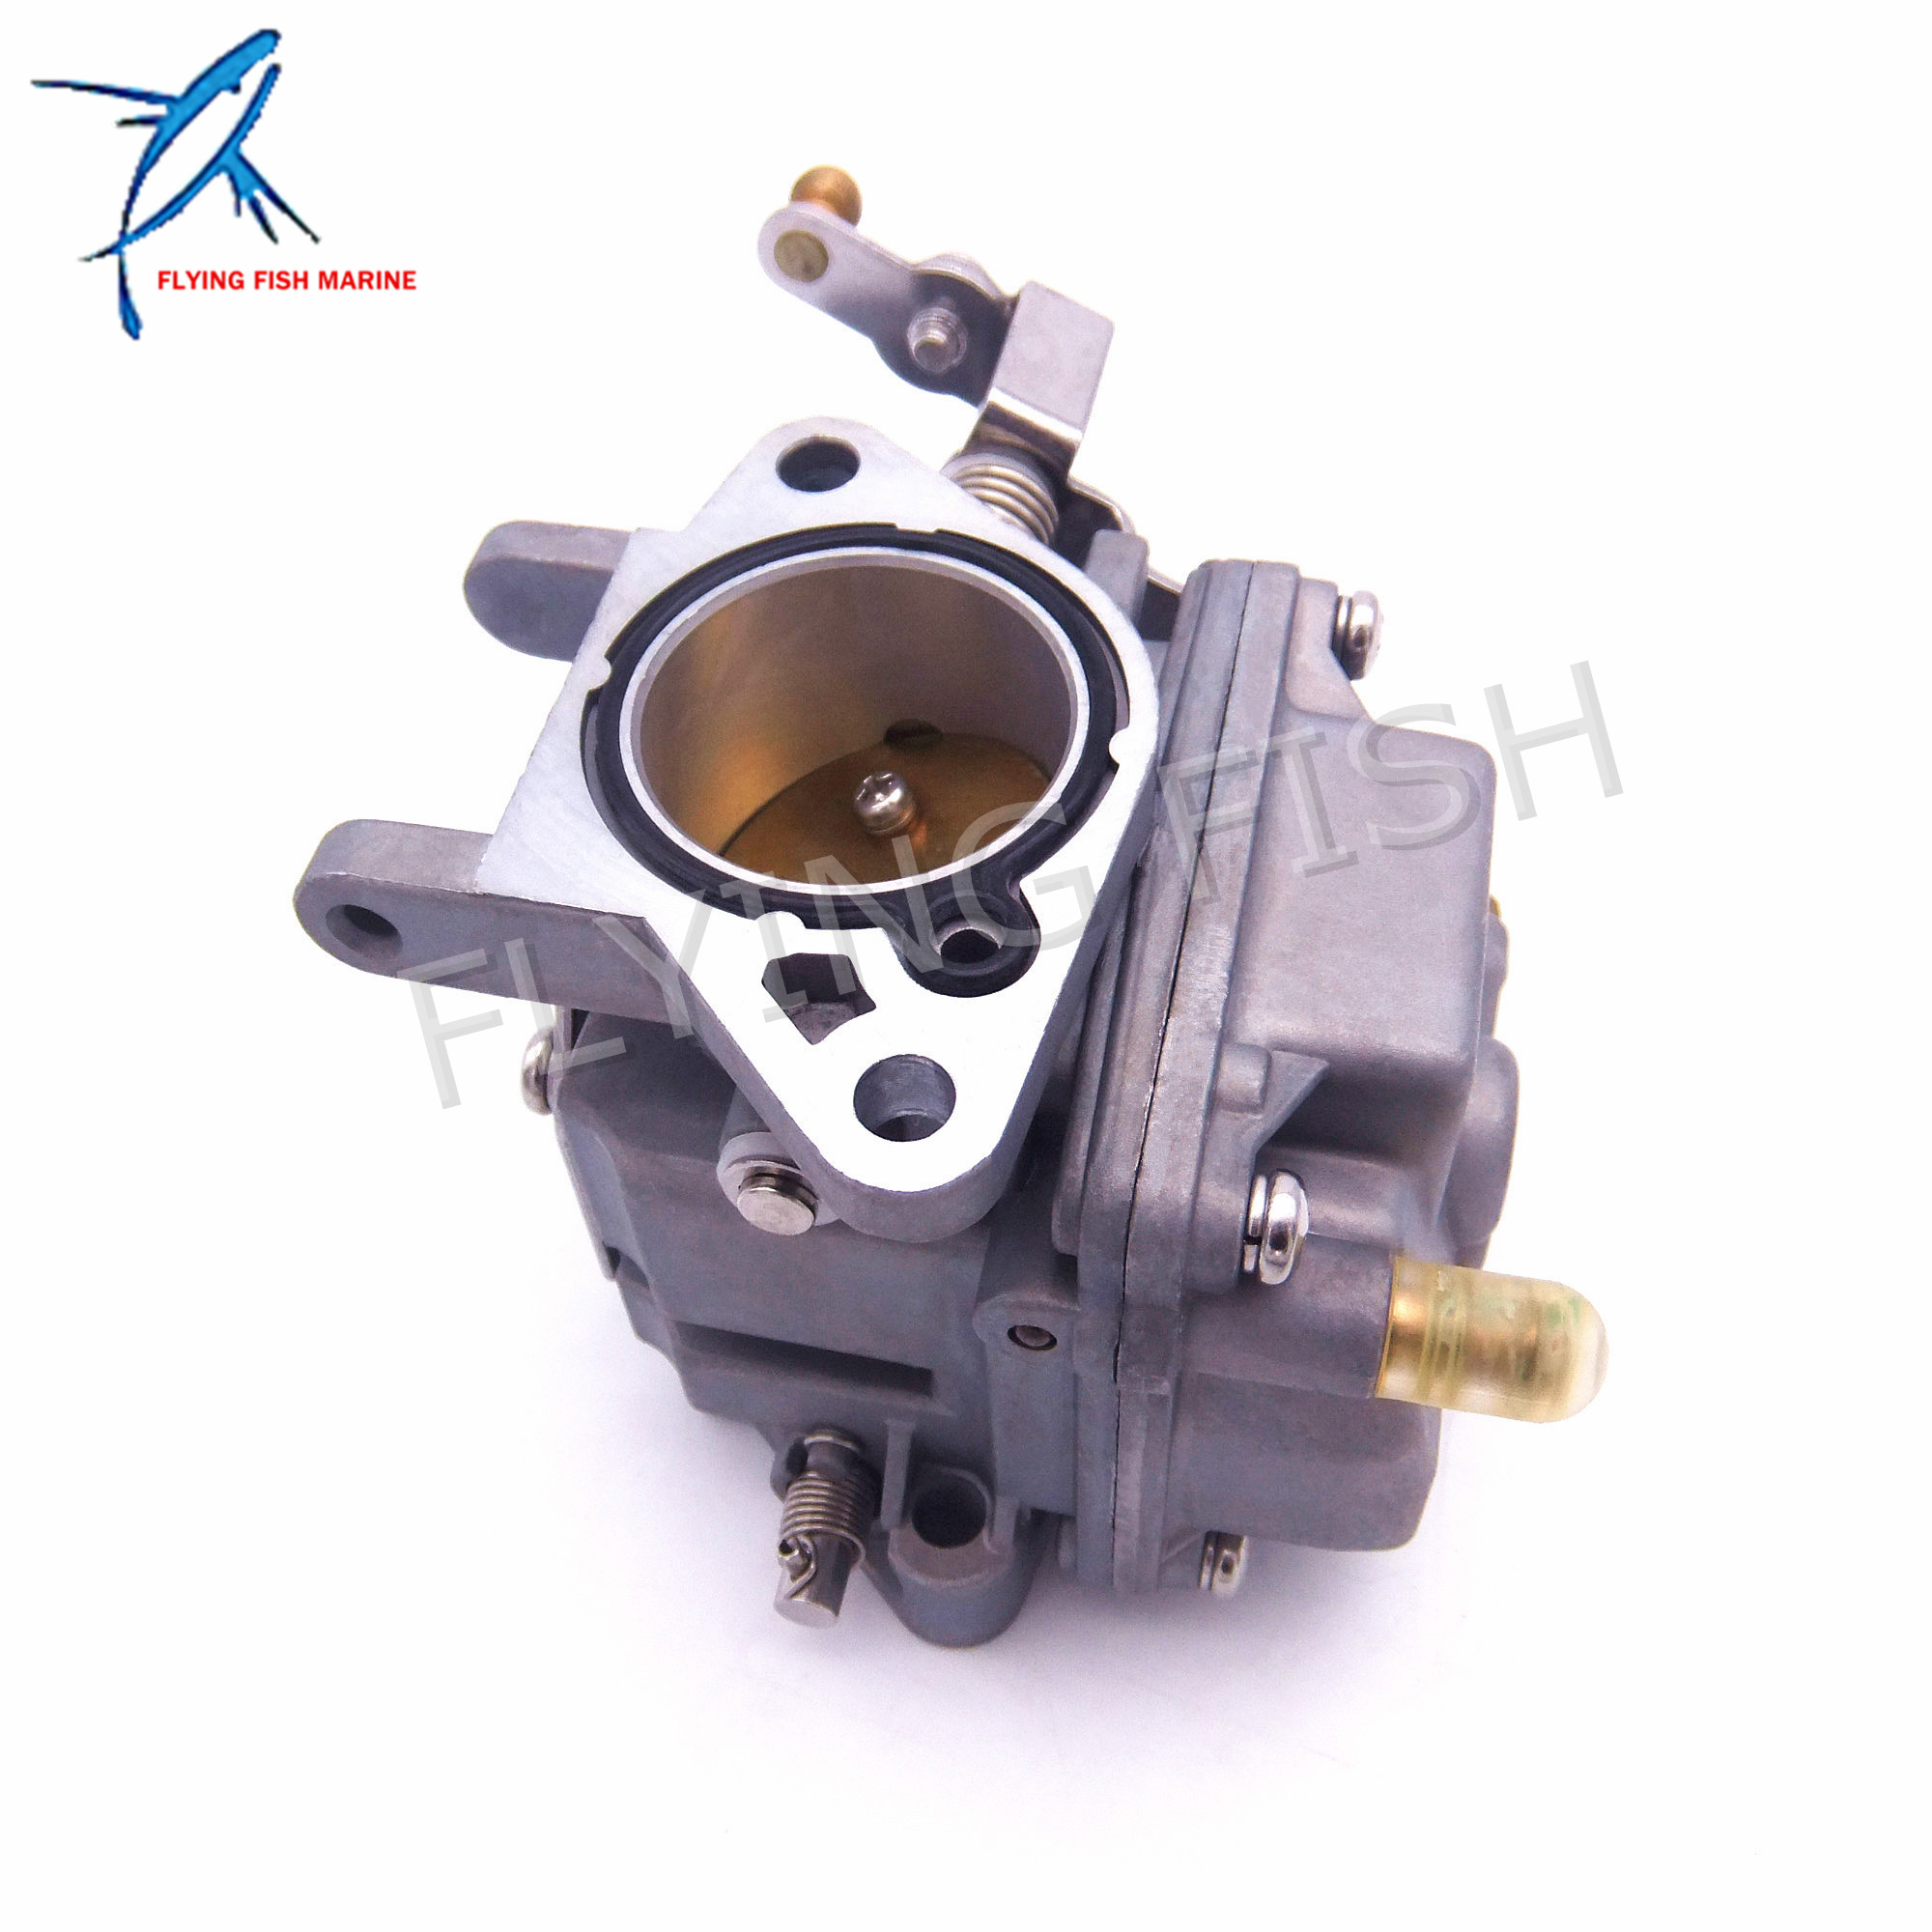 Boat Motor Carburetor Assy 30F-01.03.03.00 For Hidea 2-stroke 25F 30F Outboard Engine